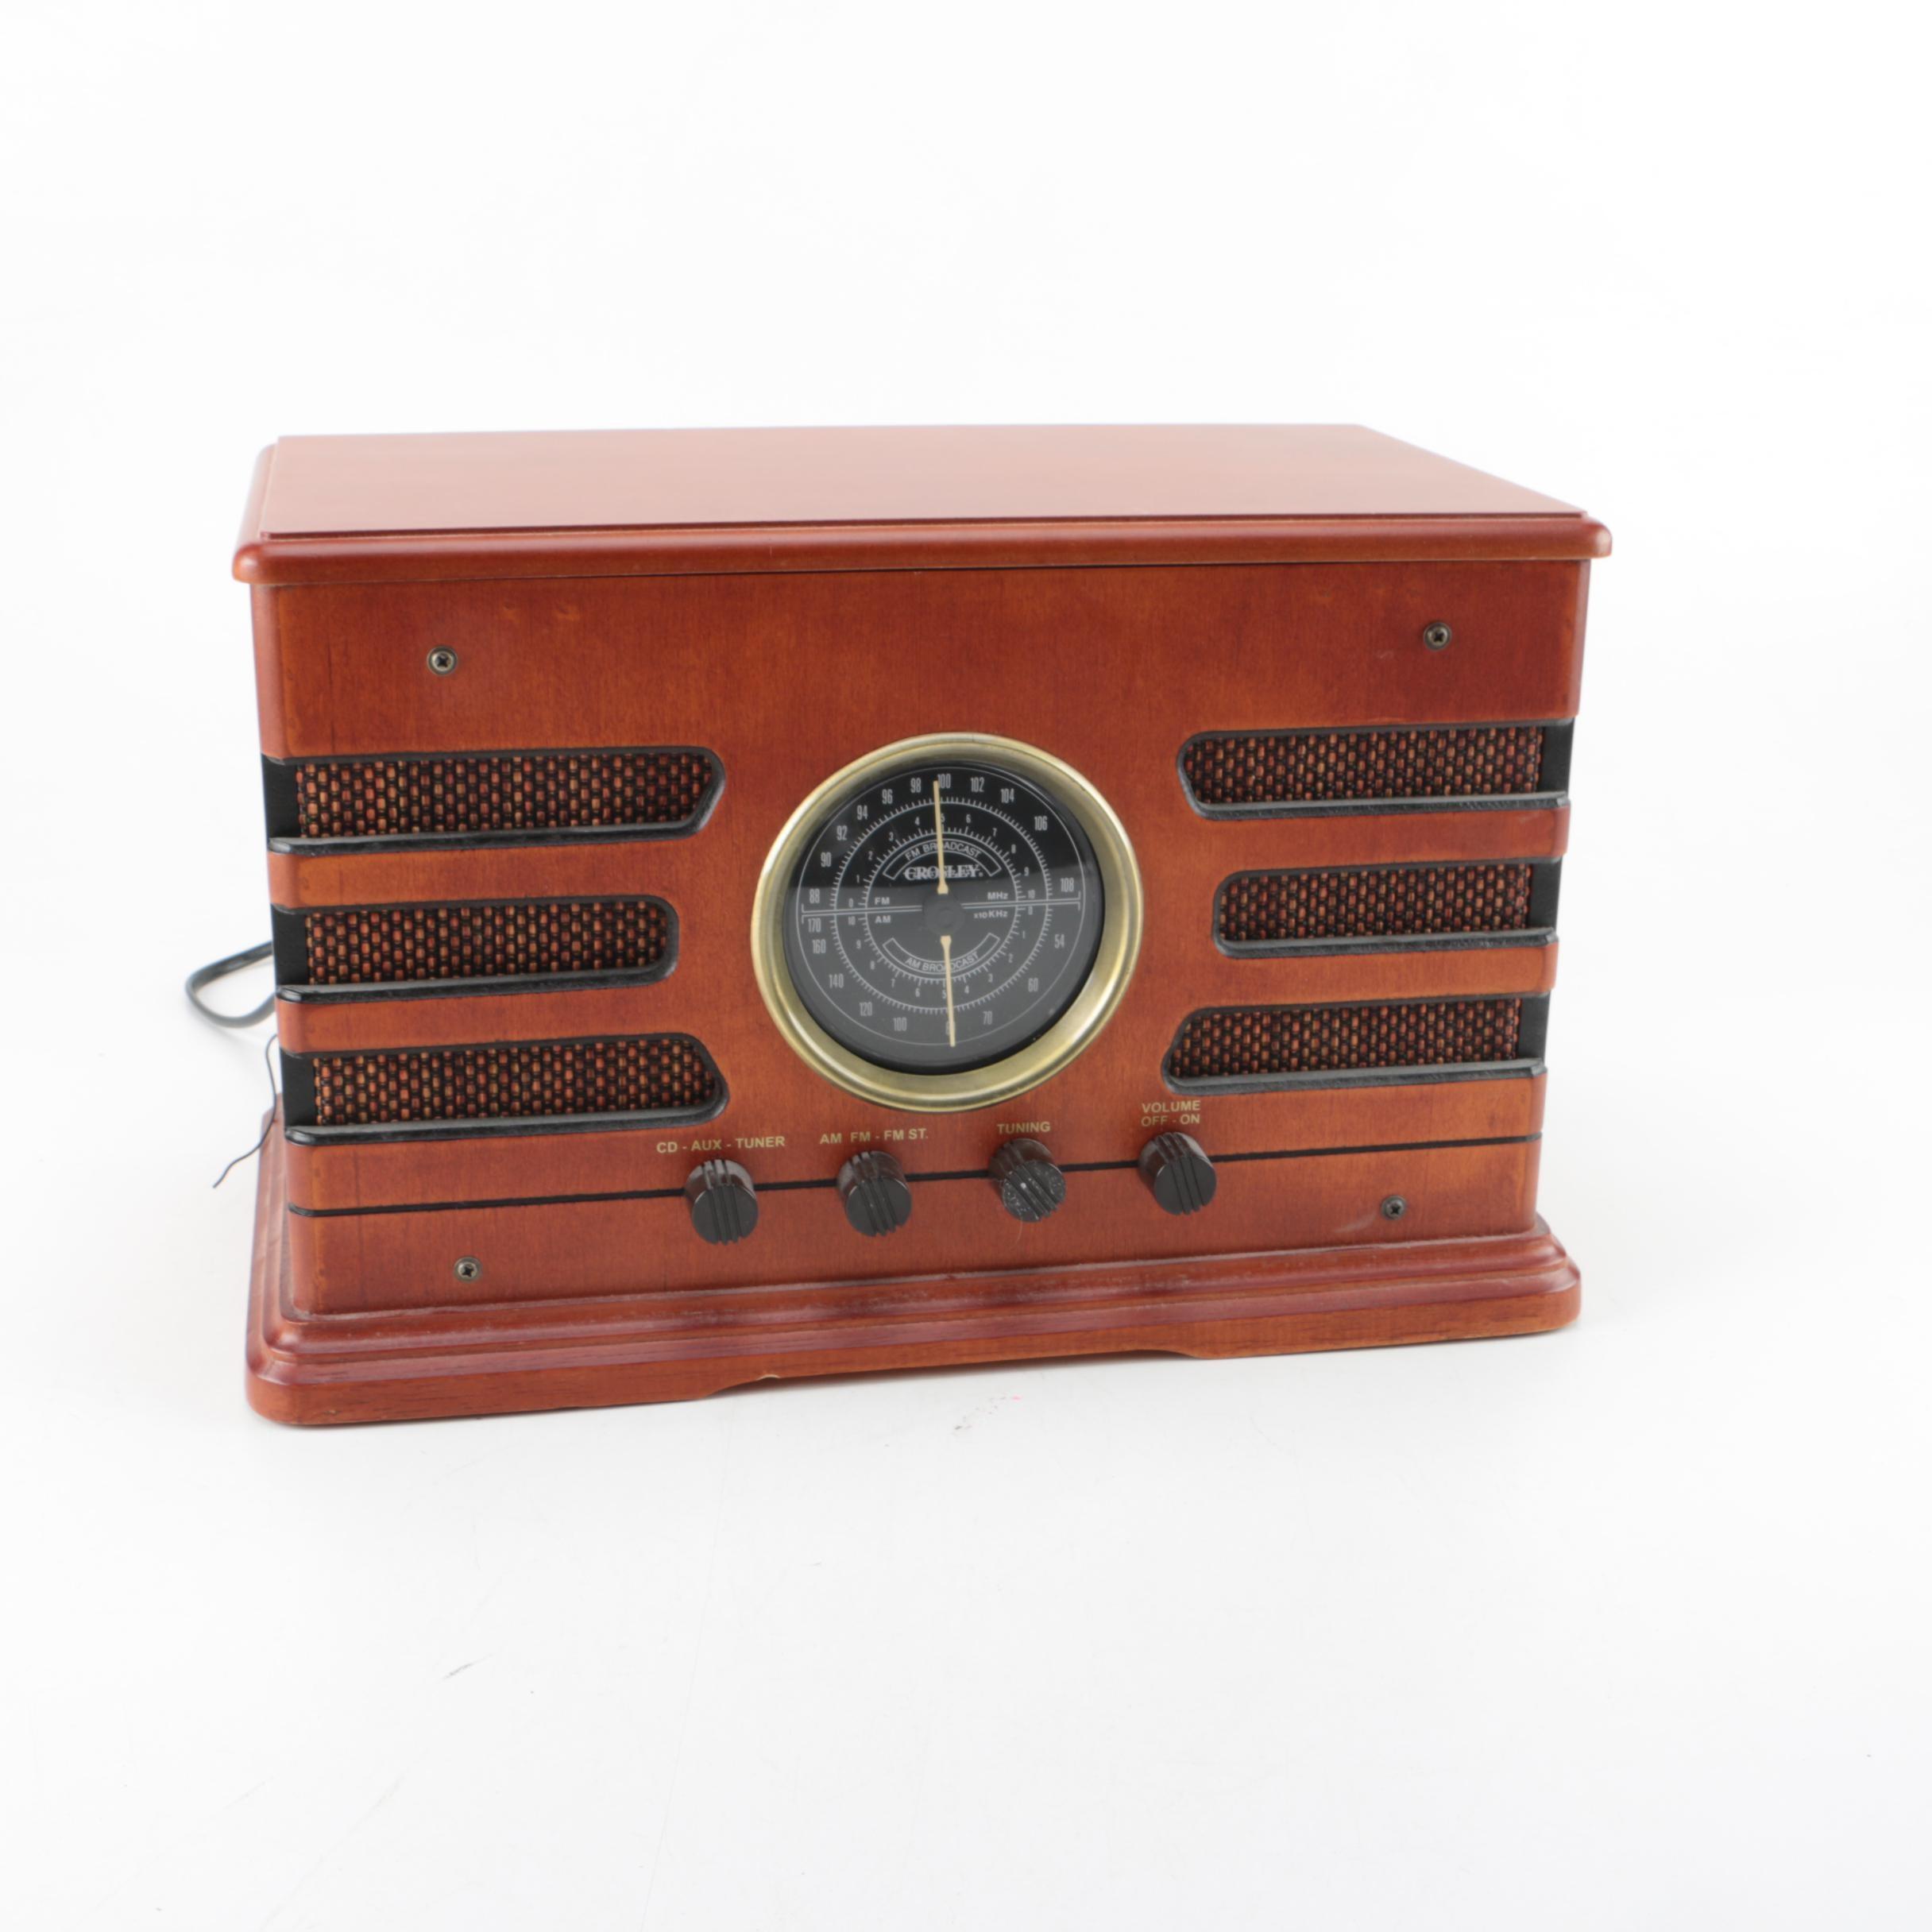 Crosley Vintage Style Radio and CD Player